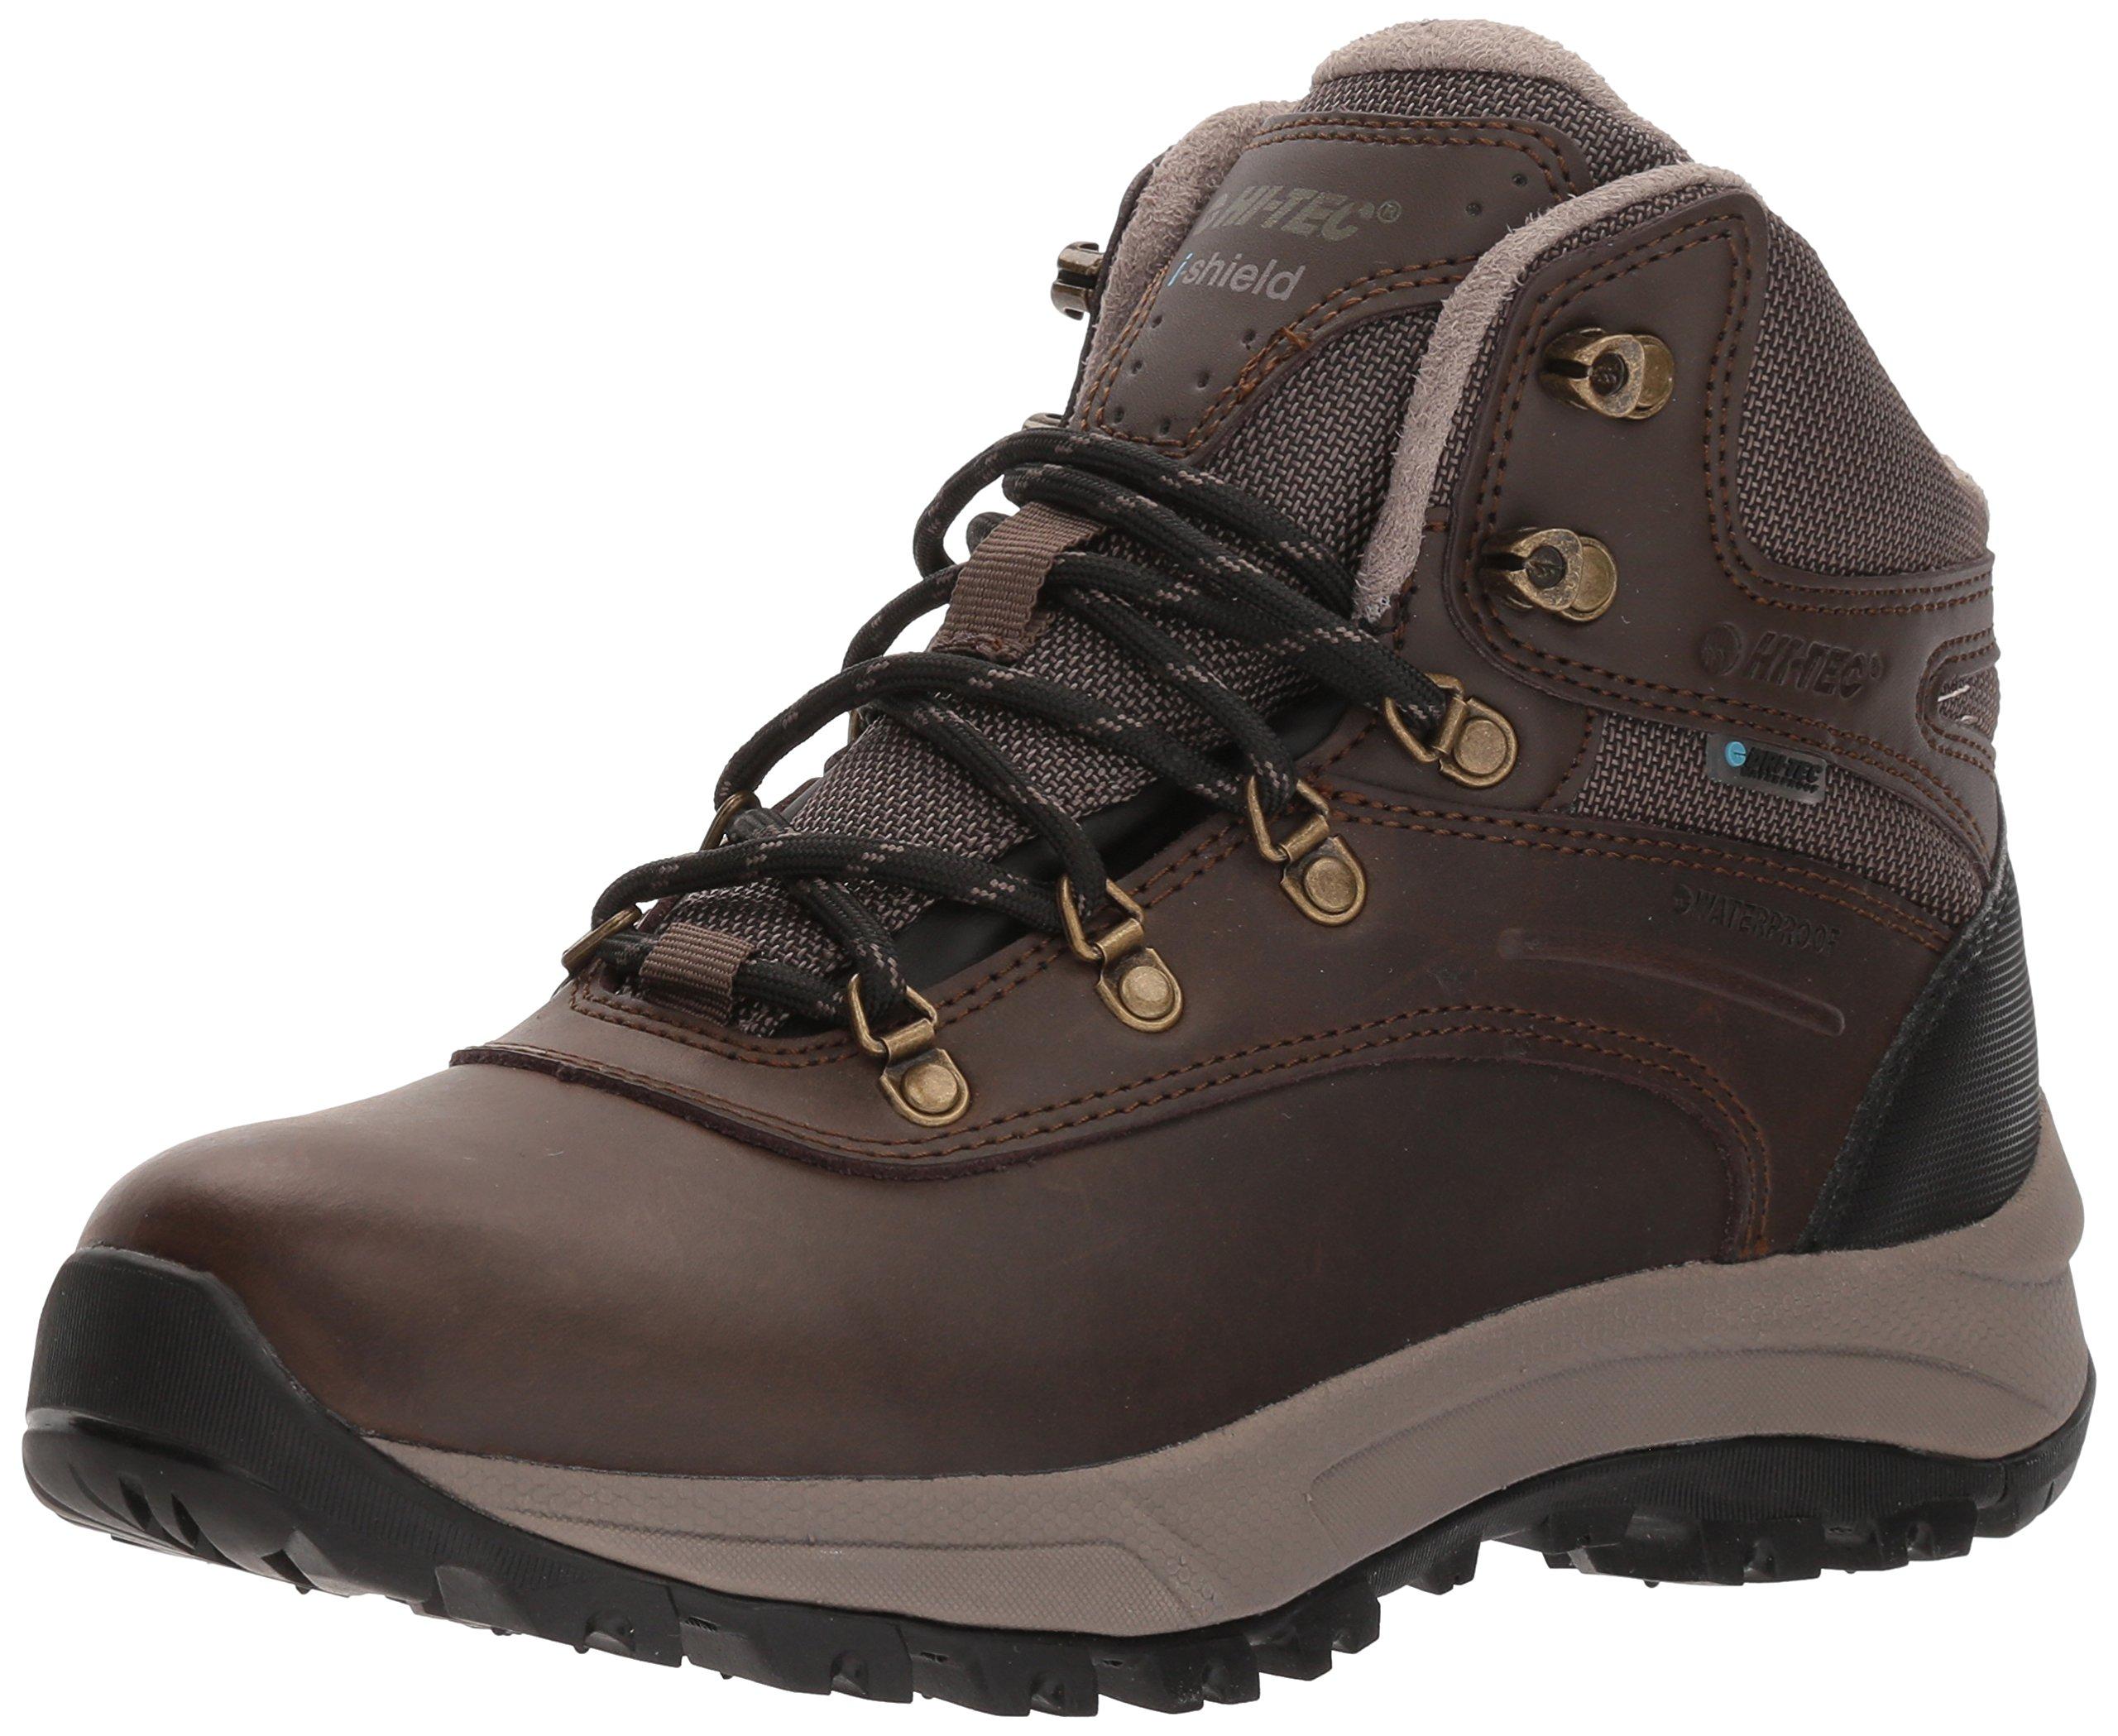 Hi-Tec Women's Altitude VI I Waterproof Hiking Boot, Dark Chocolate/Black, 095M Medium US by Hi-Tec